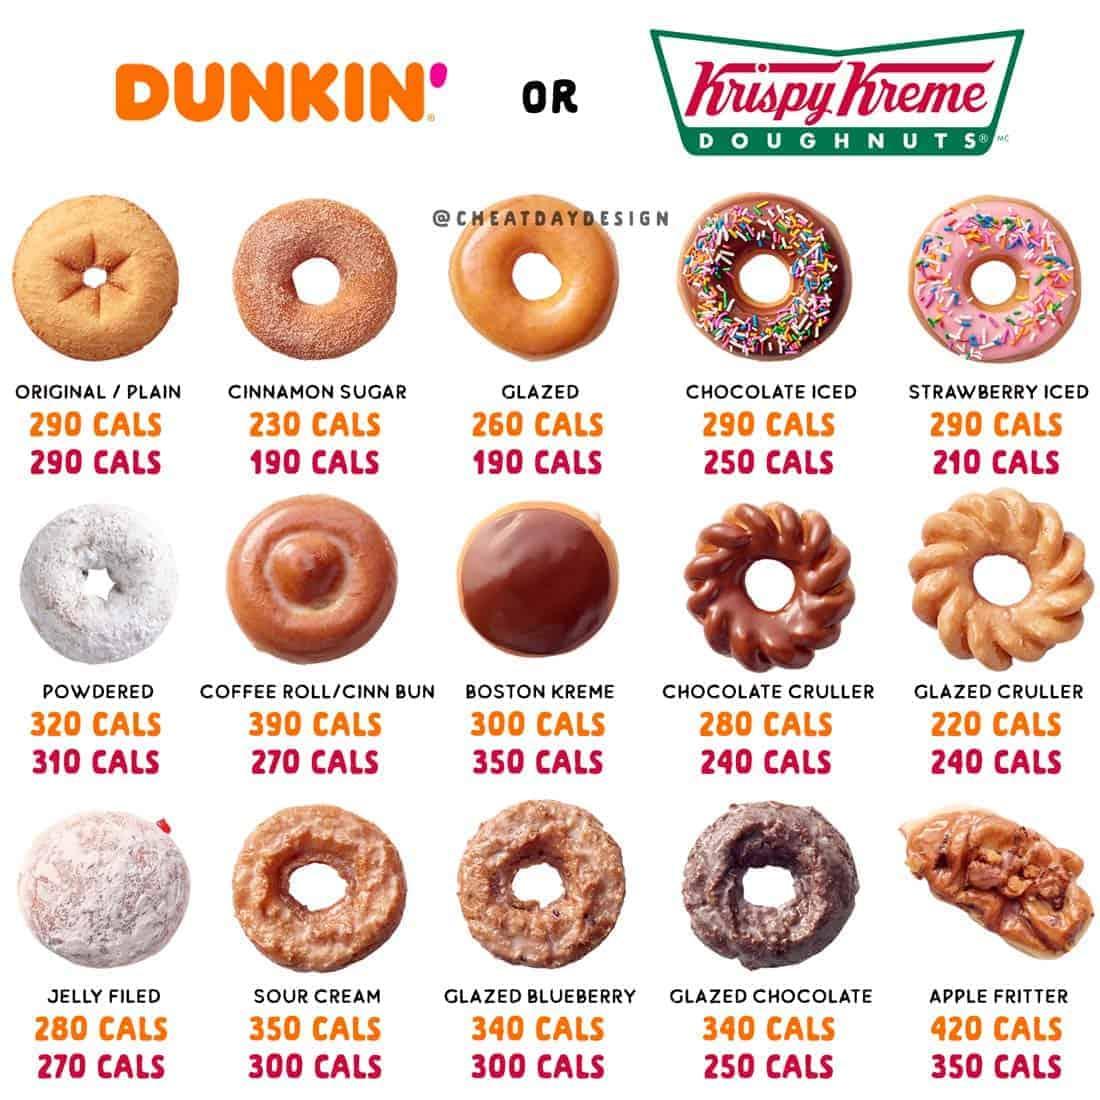 Is Dunkin Donuts or Krispy Kreme healthier?